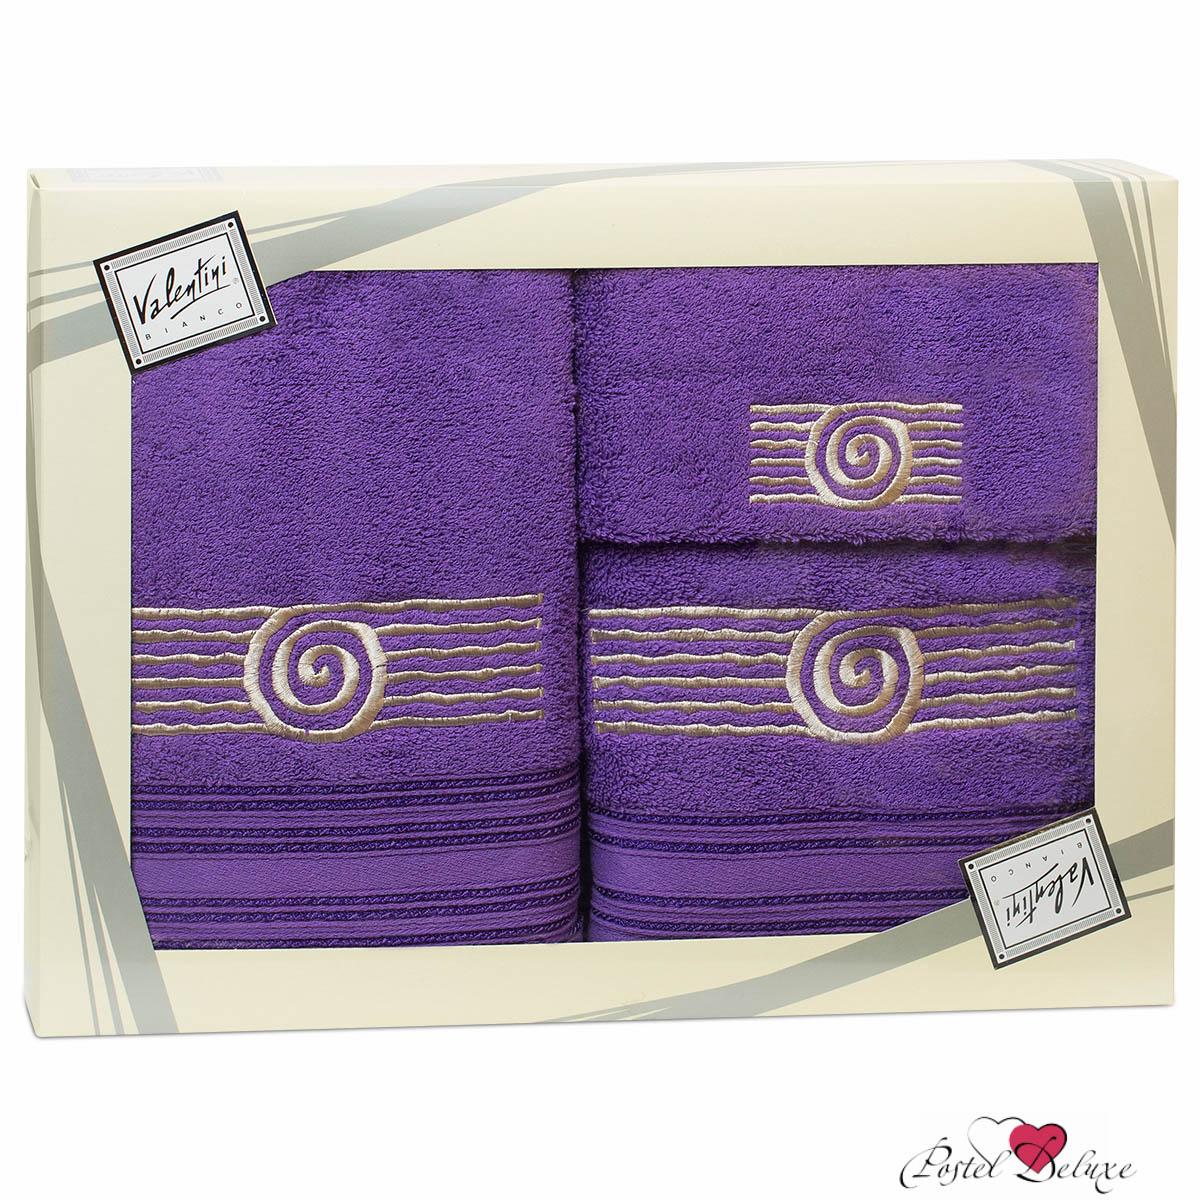 Купить Полотенца Valentini, Полотенце Sea Цвет: Сиреневый (Набор), Португалия, Махра